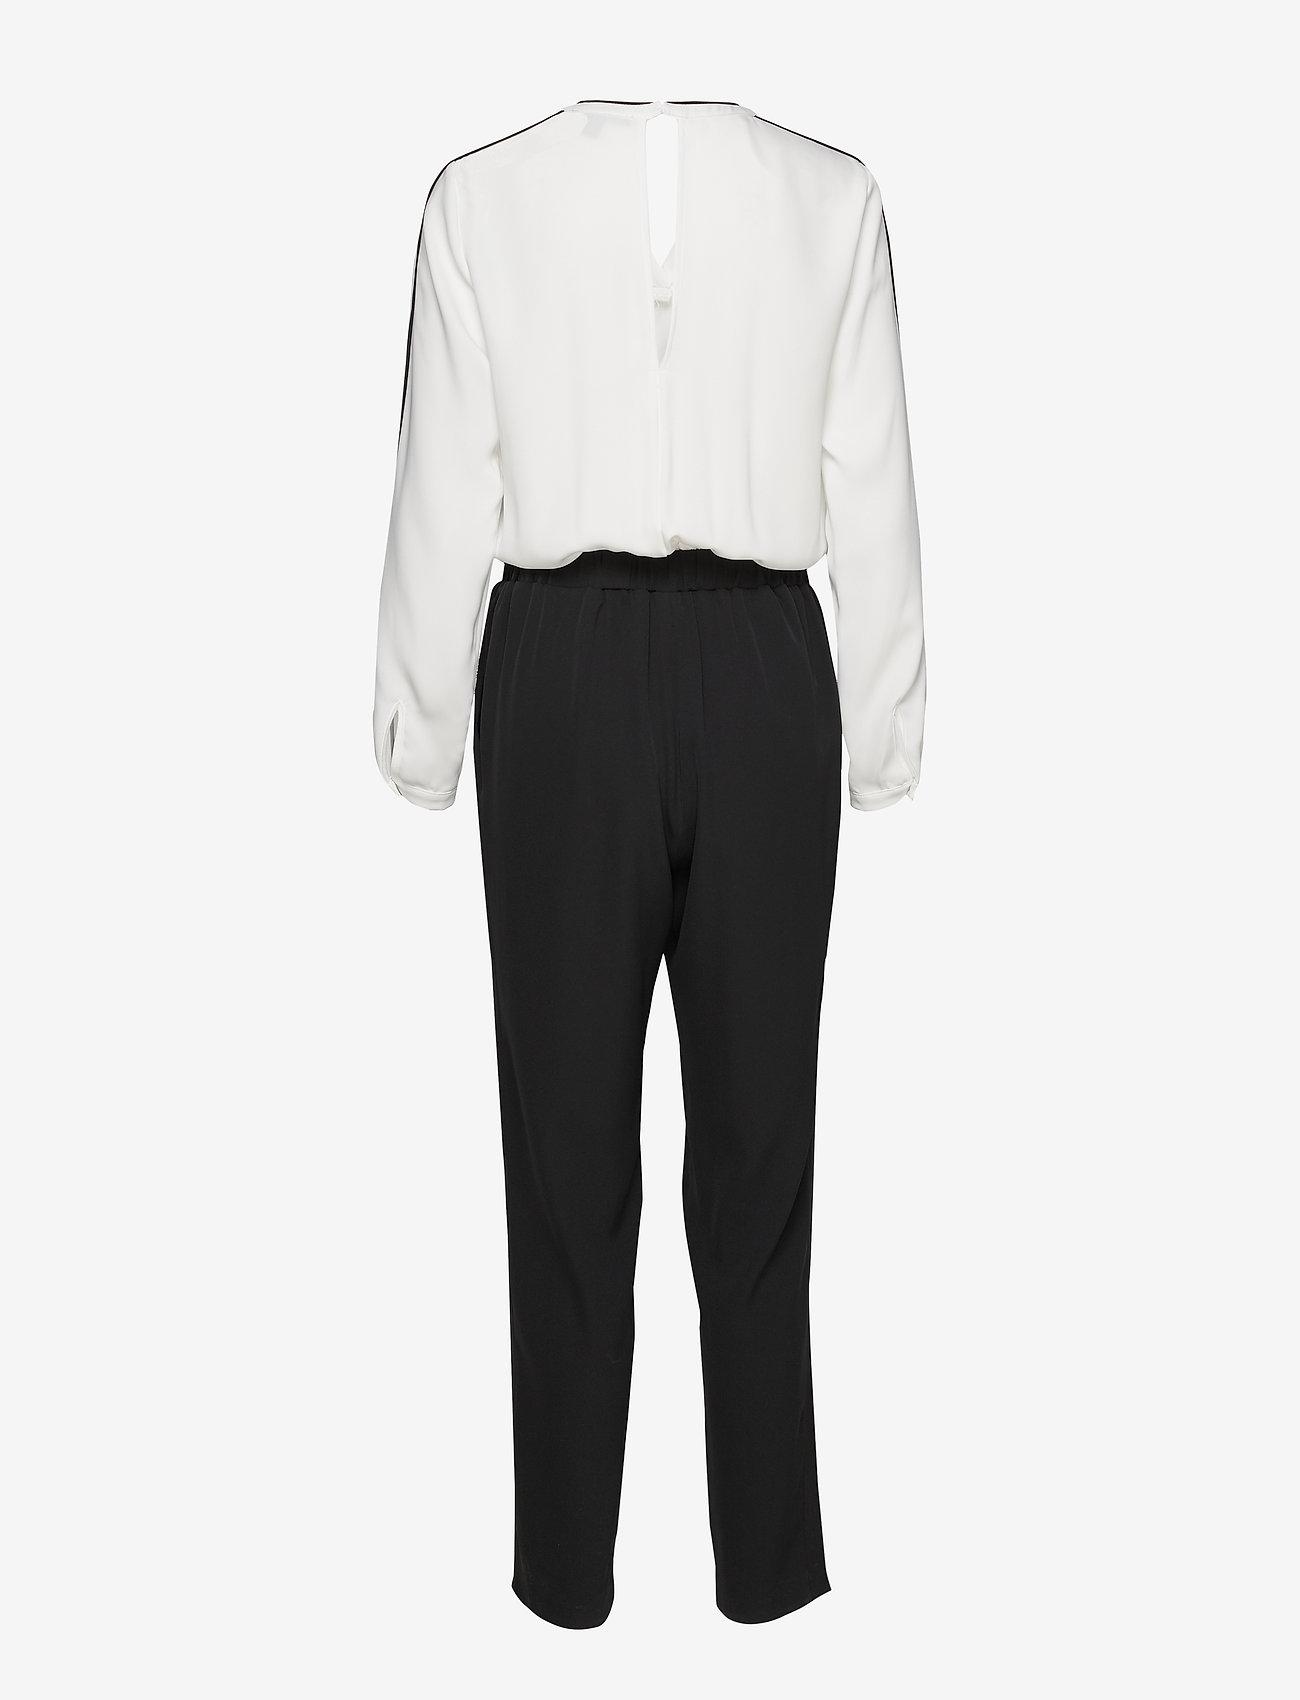 Esprit Collection Overalls Woven - Combinaisons